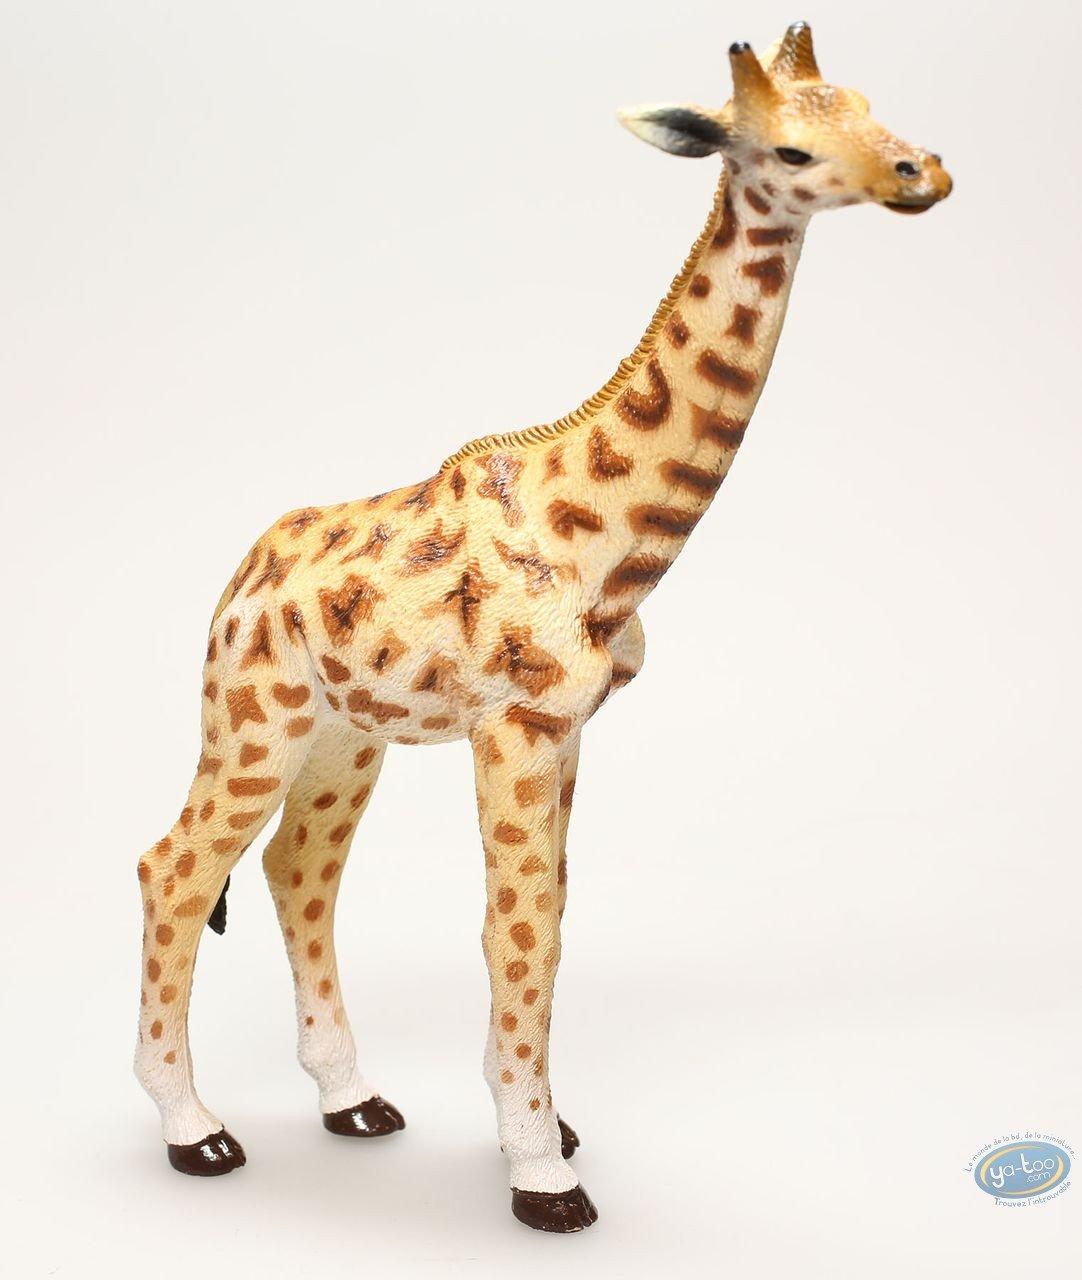 Figurine plastique, Animaux : Girafe